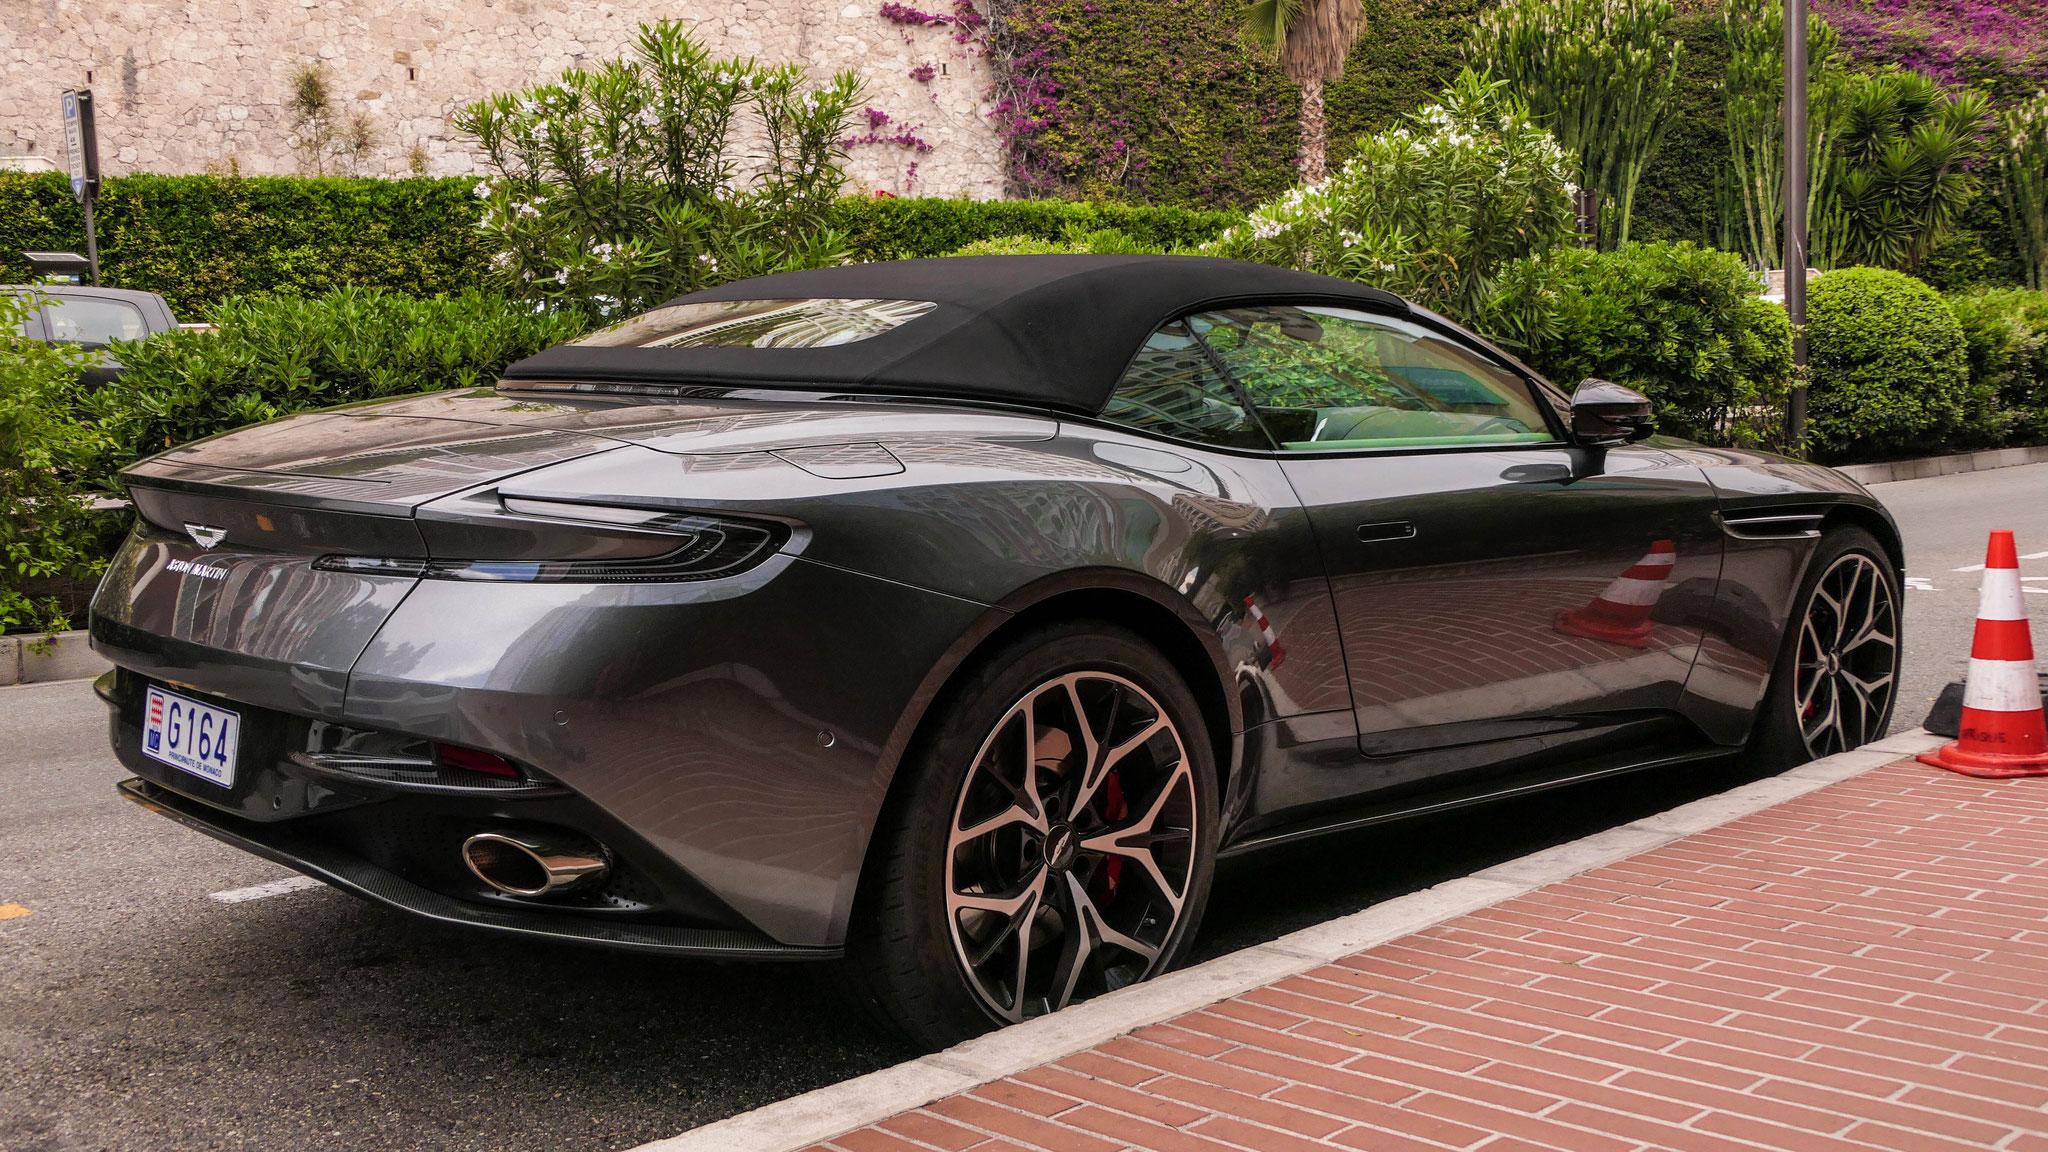 Aston Martin DB11 Volante - G164 (MC)